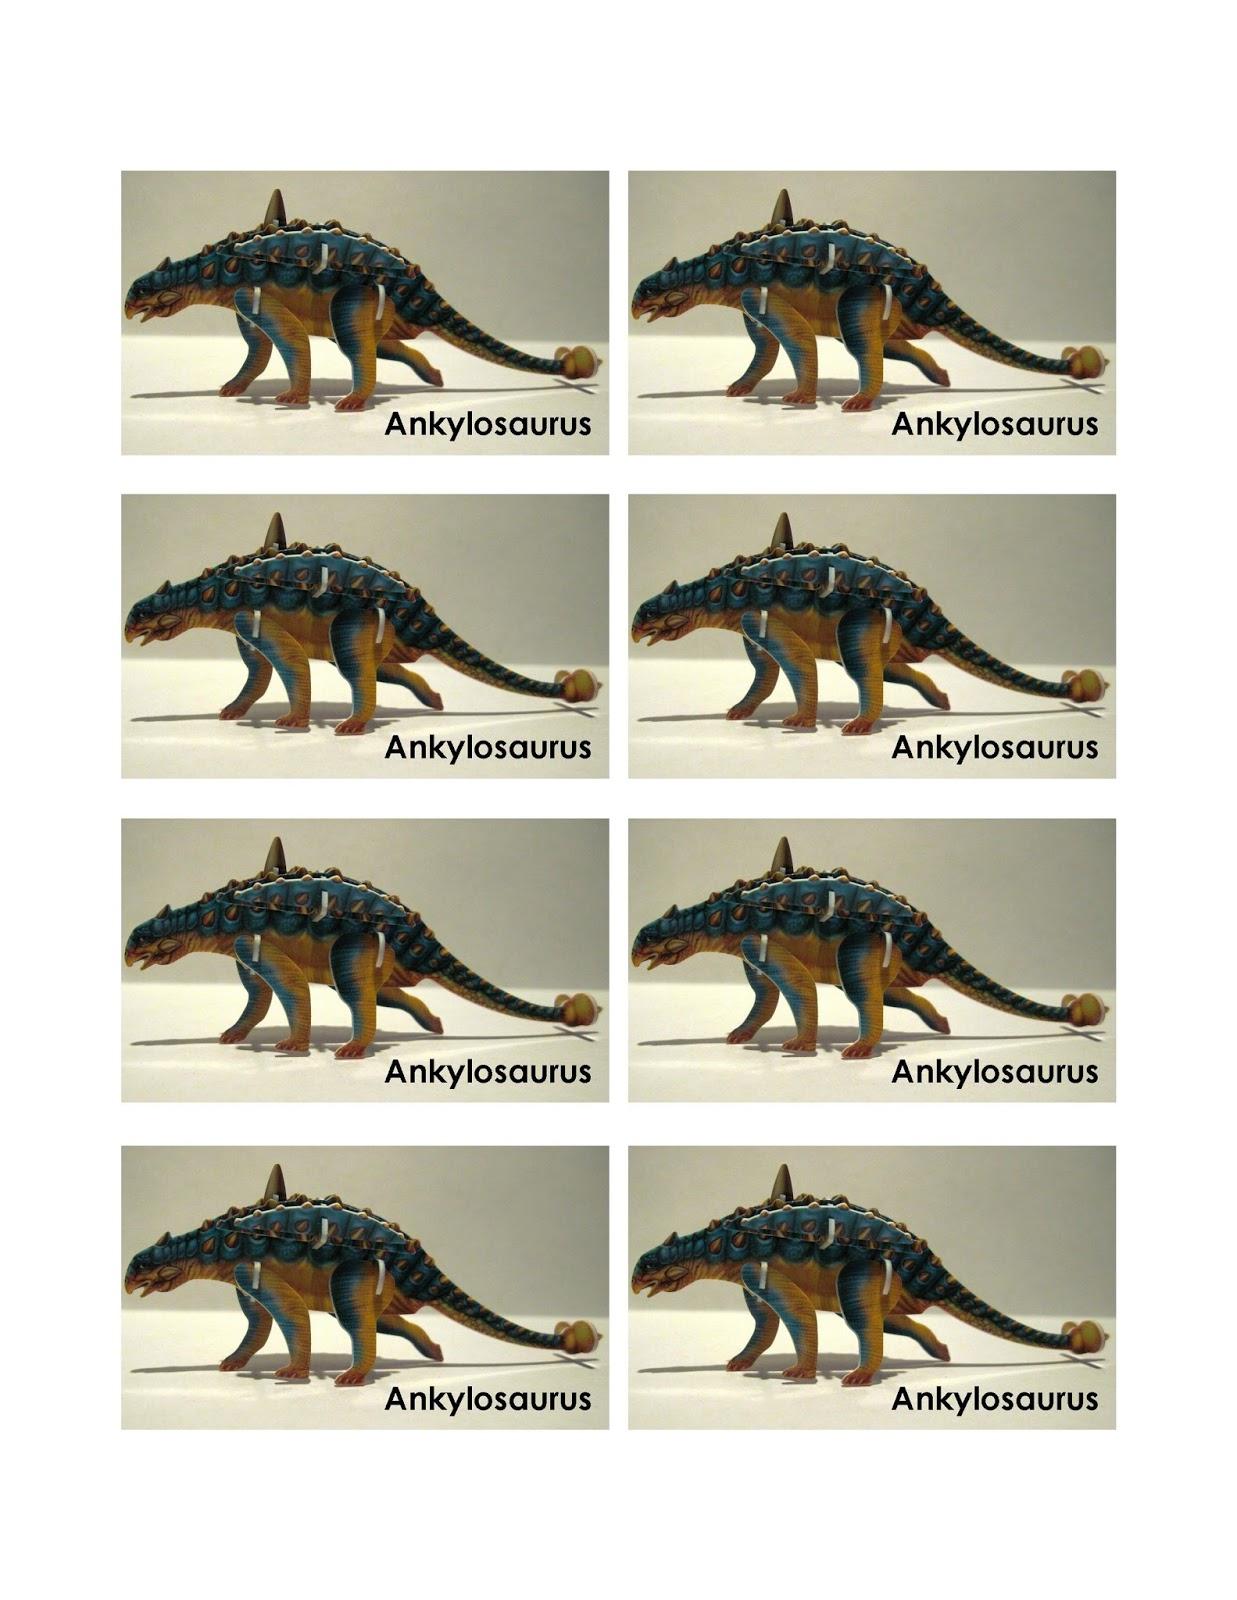 Simply Shoeboxes: Printable Instructions For Building 3D Dinosaur - Printable 3D Puzzle